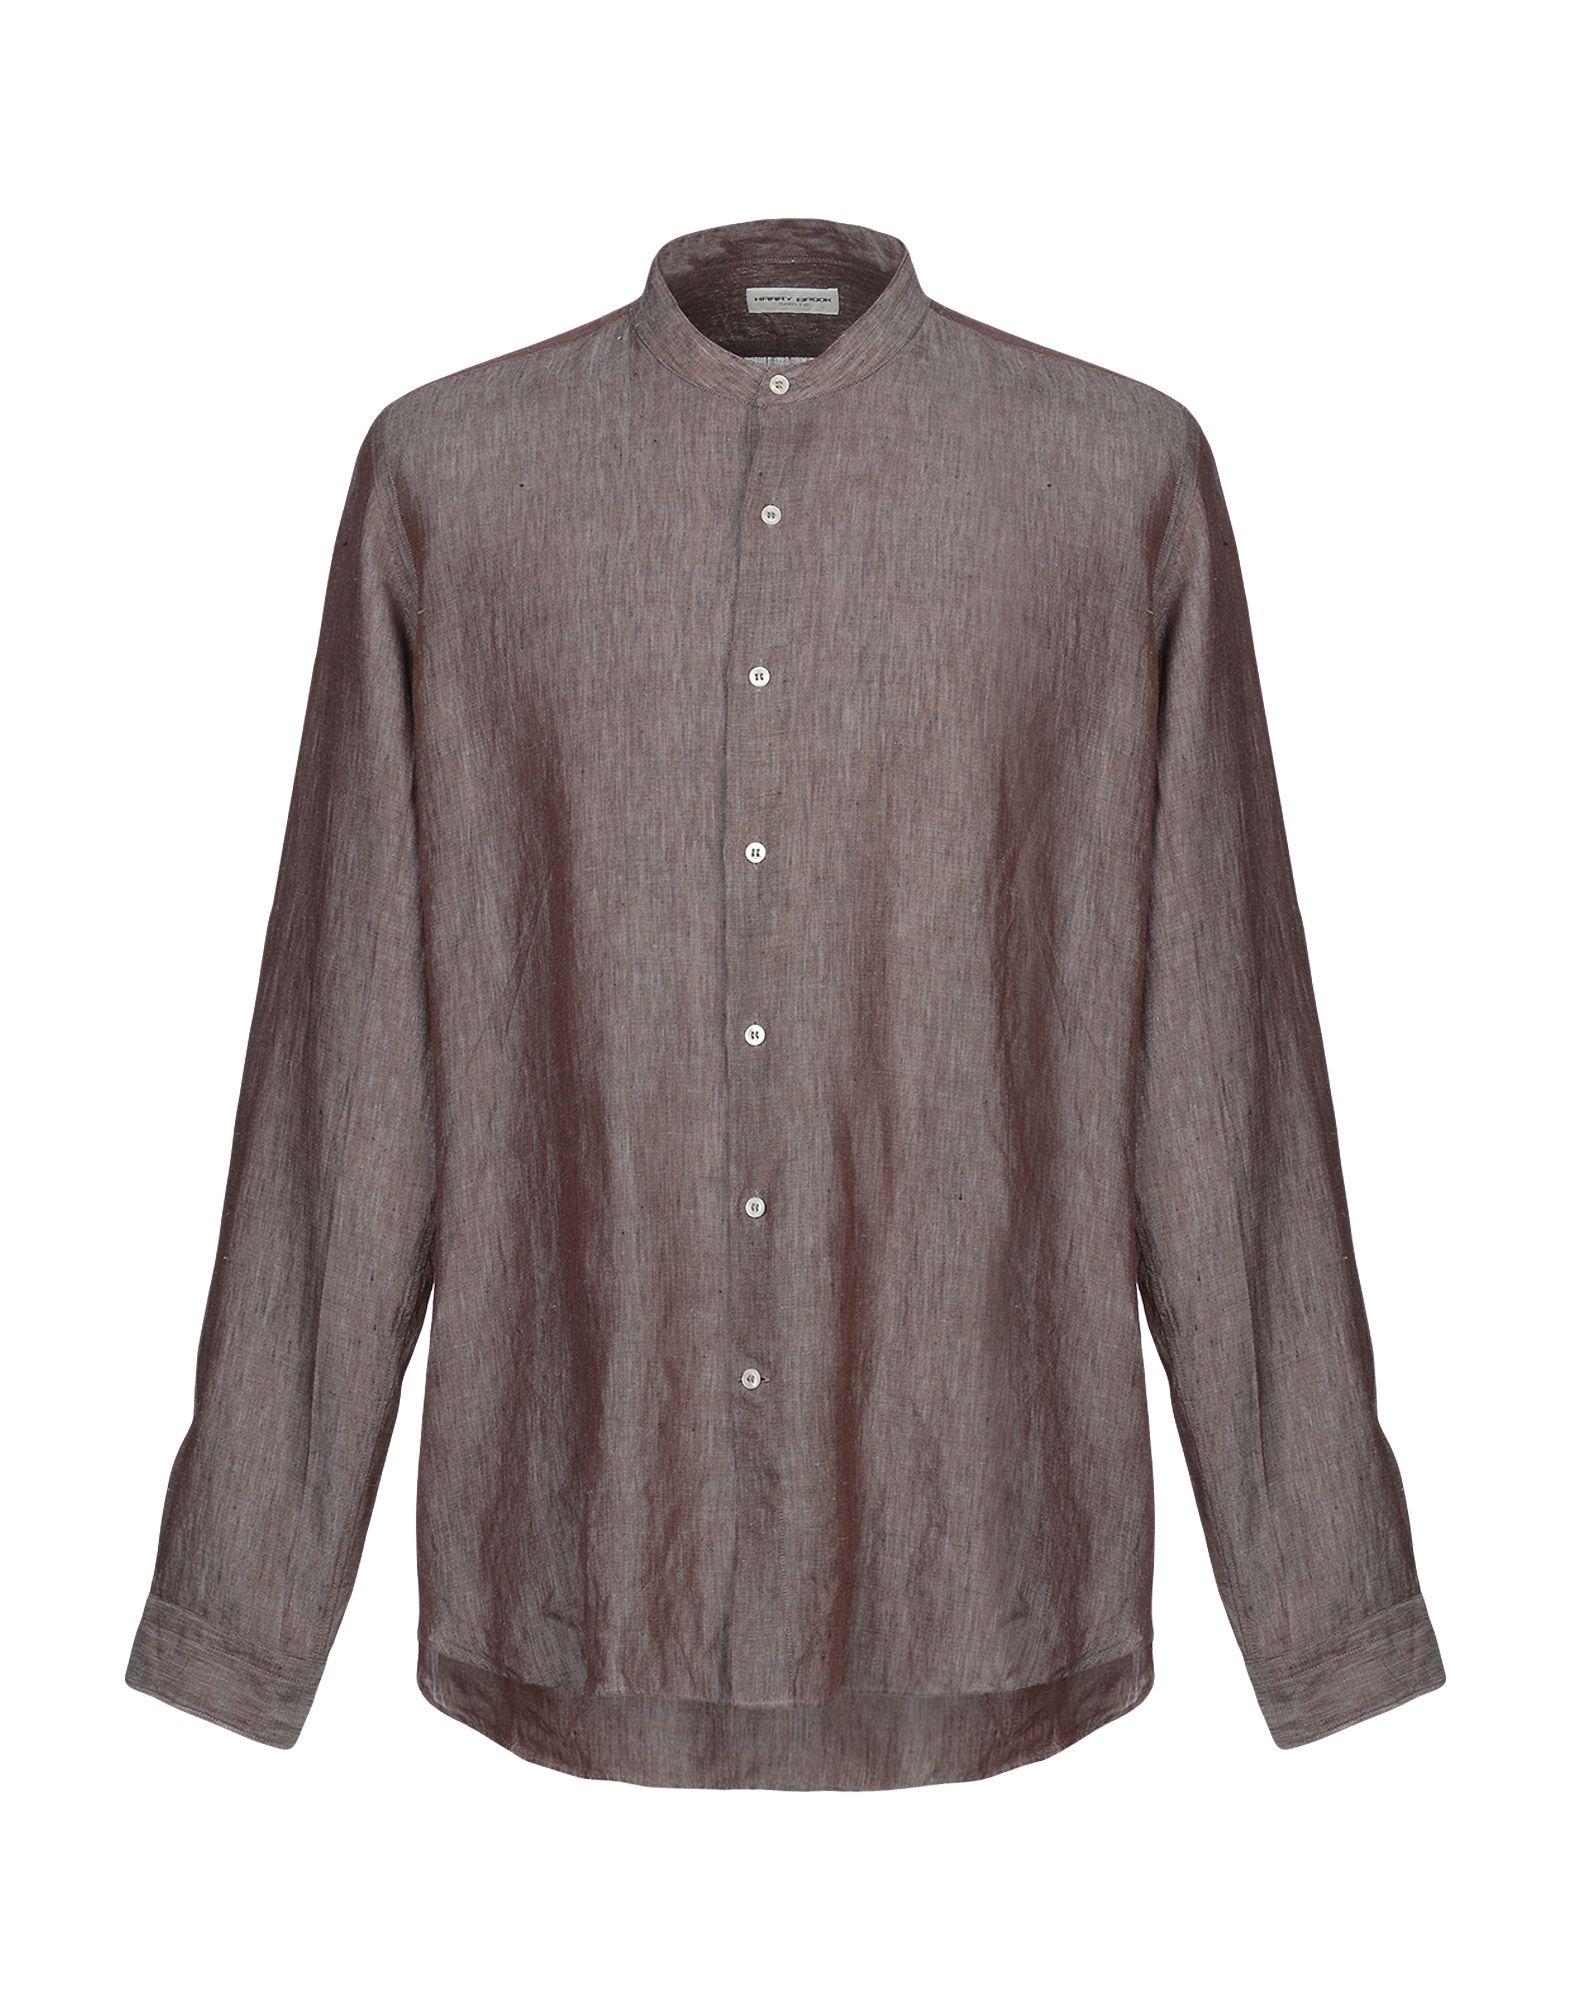 HARRY BROOK Pубашка подвеска шишки в связке 3шт 6см стекло в асс те